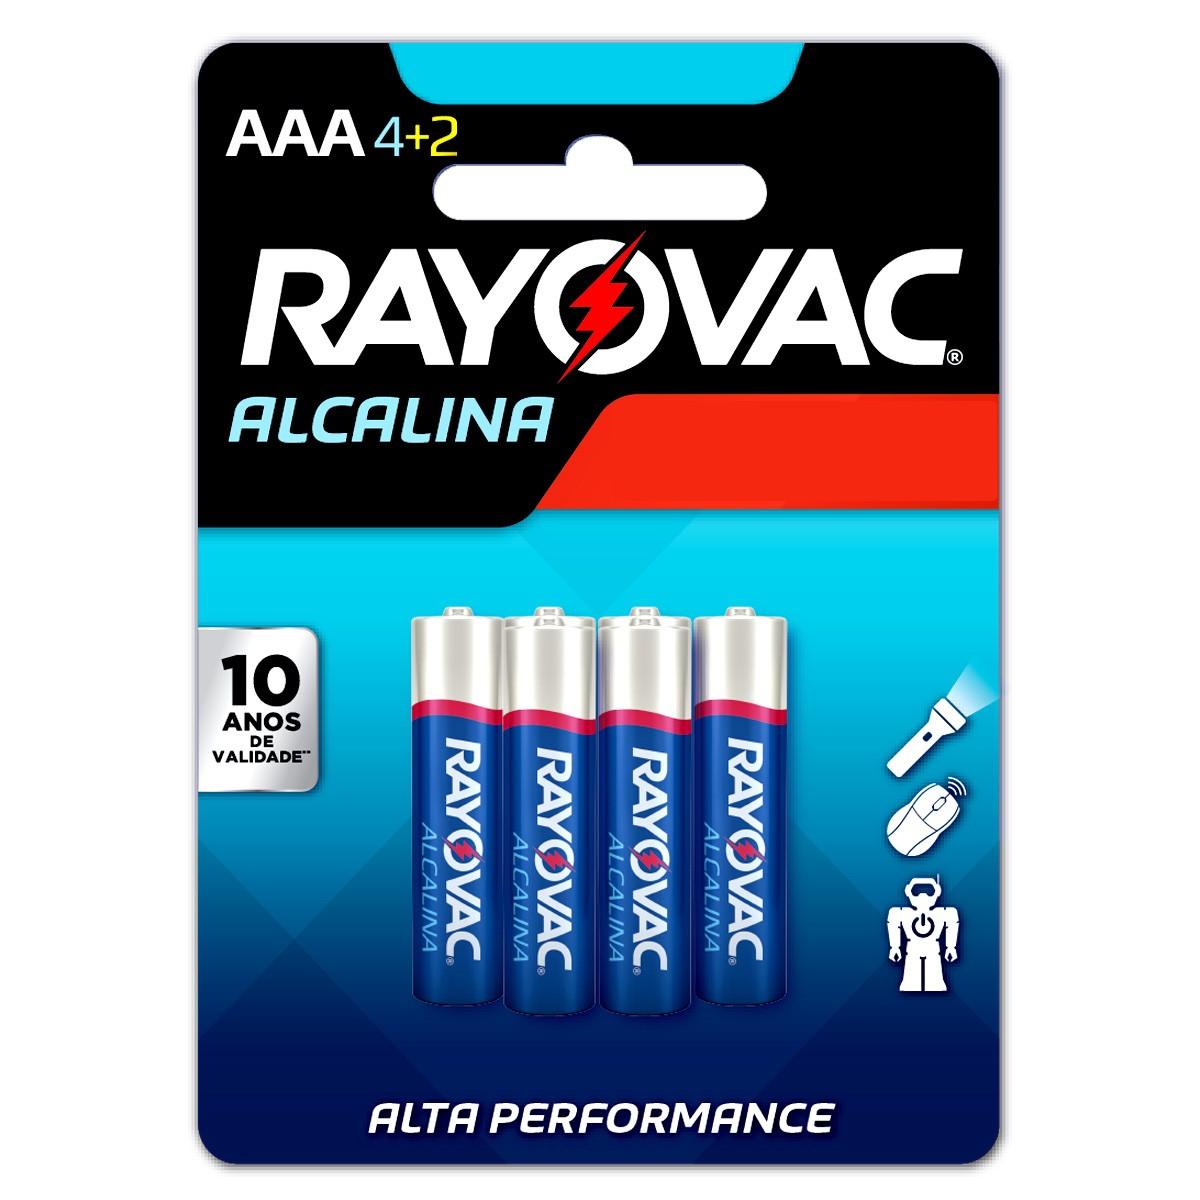 360 Pilhas AAA Alcalina RAYOVAC 60 cartelas